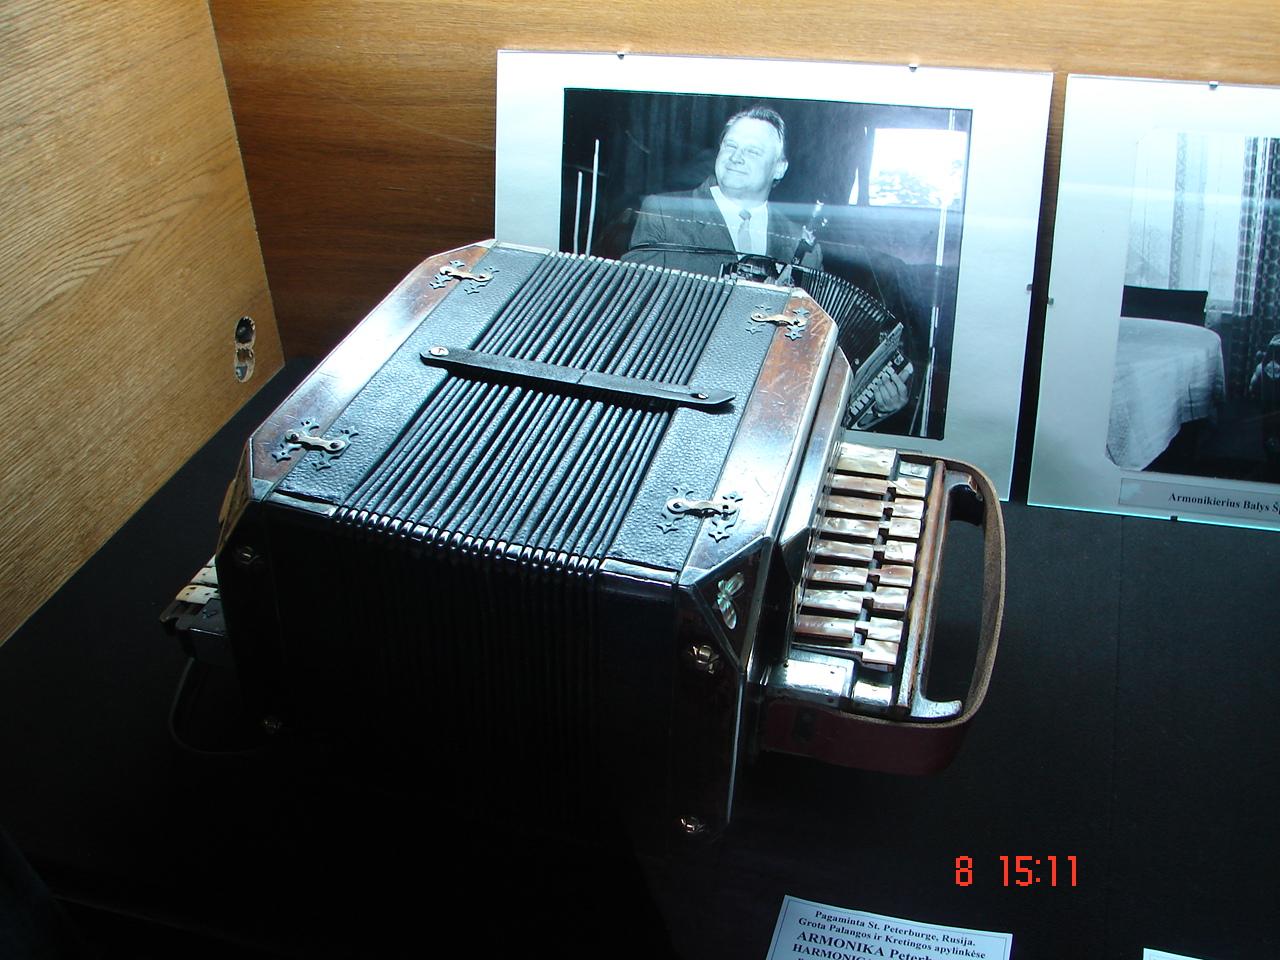 DSC06396.JPG